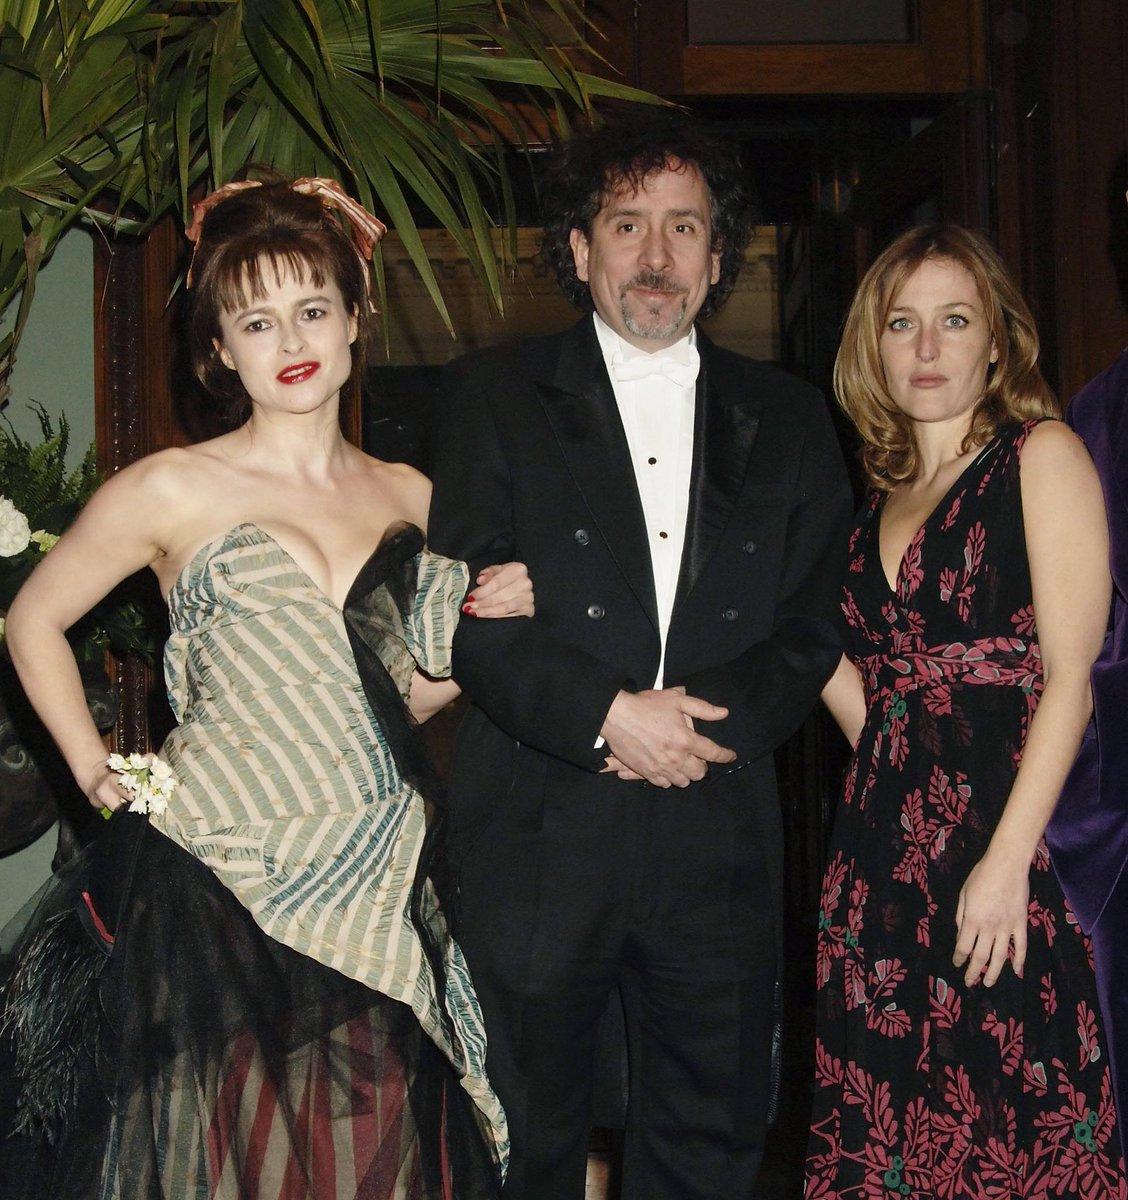 "Anderson Gillian Nue helena bonham carter on twitter: ""belle époque gala dinner"